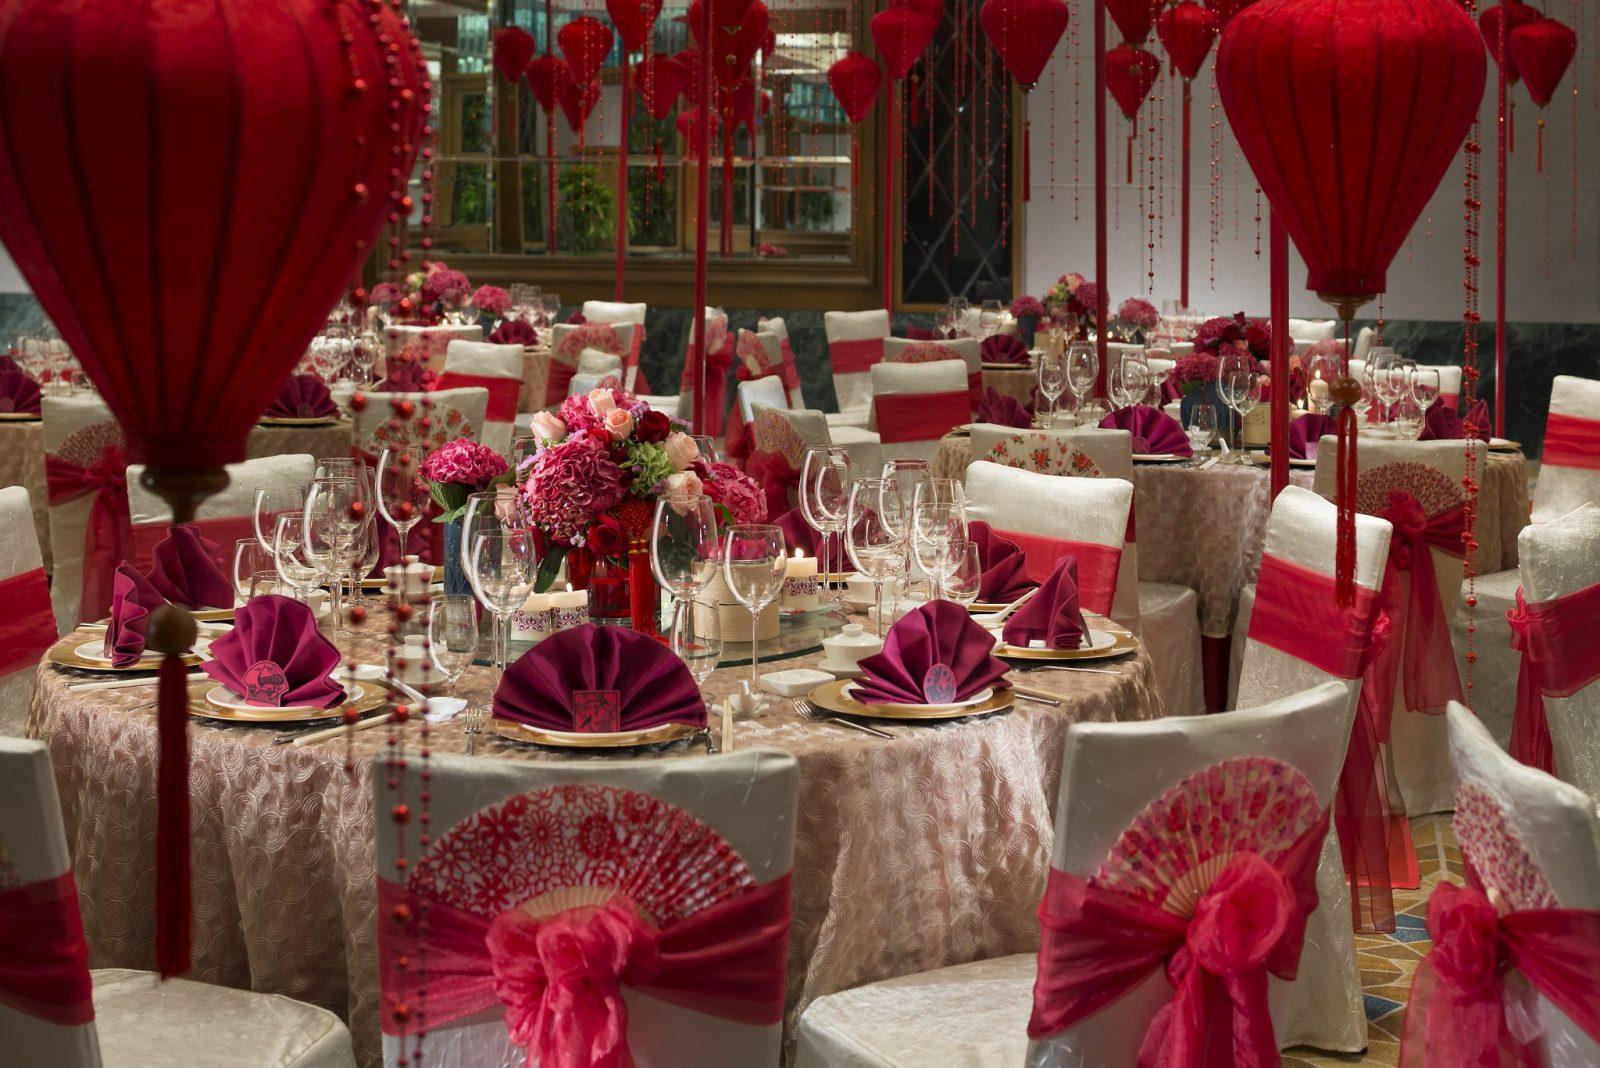 kuala-lumpur-2013-event-venue-chinese-wedding